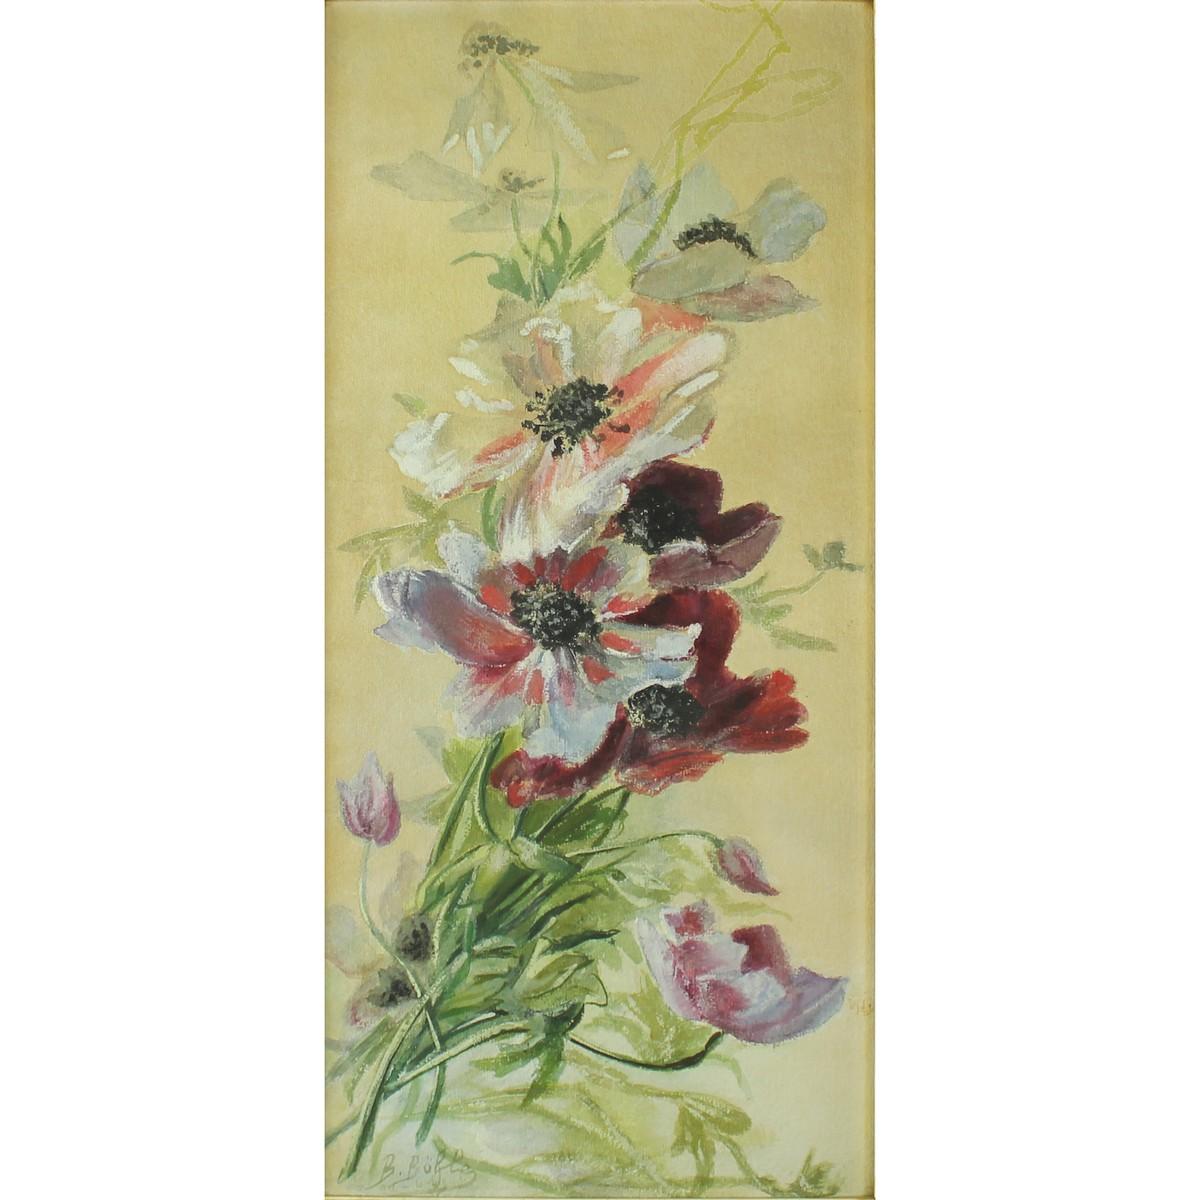 Lot 59 - Buhley,B? Nineteenth Century, Flowers